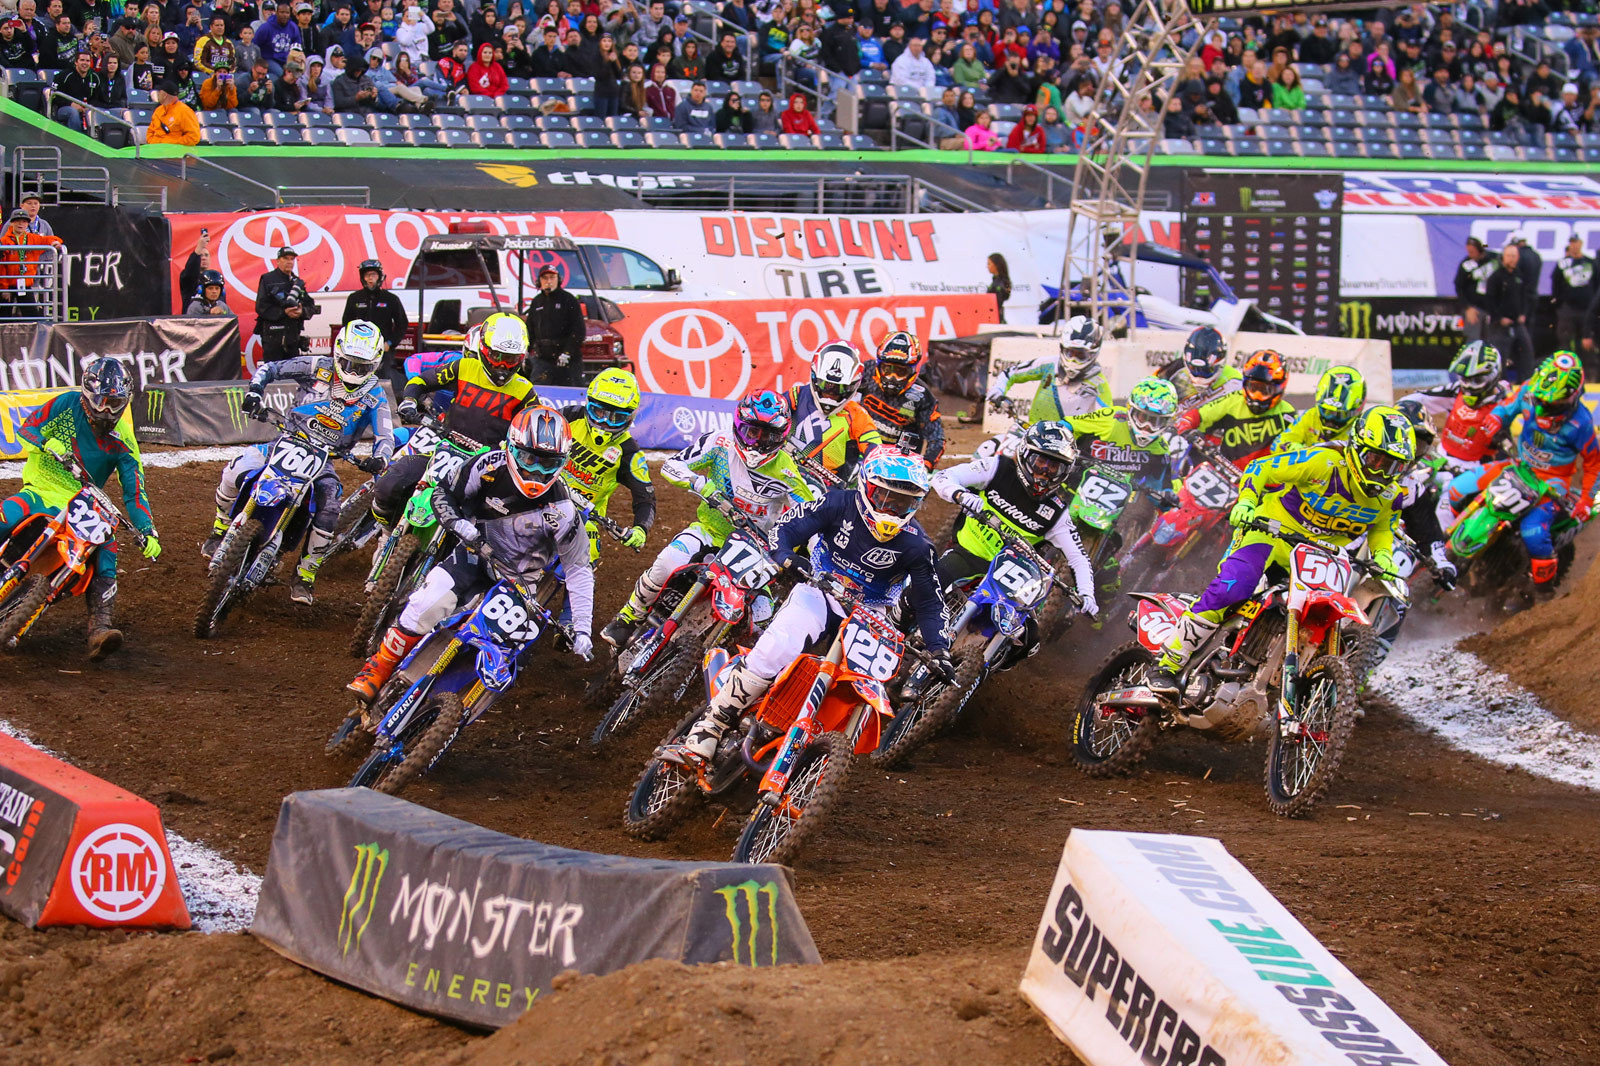 East Rutherford Photo Blast - 250 Heat Race One Start - Photo Blast: East Rutherford - Motocross Pictures - Vital MX